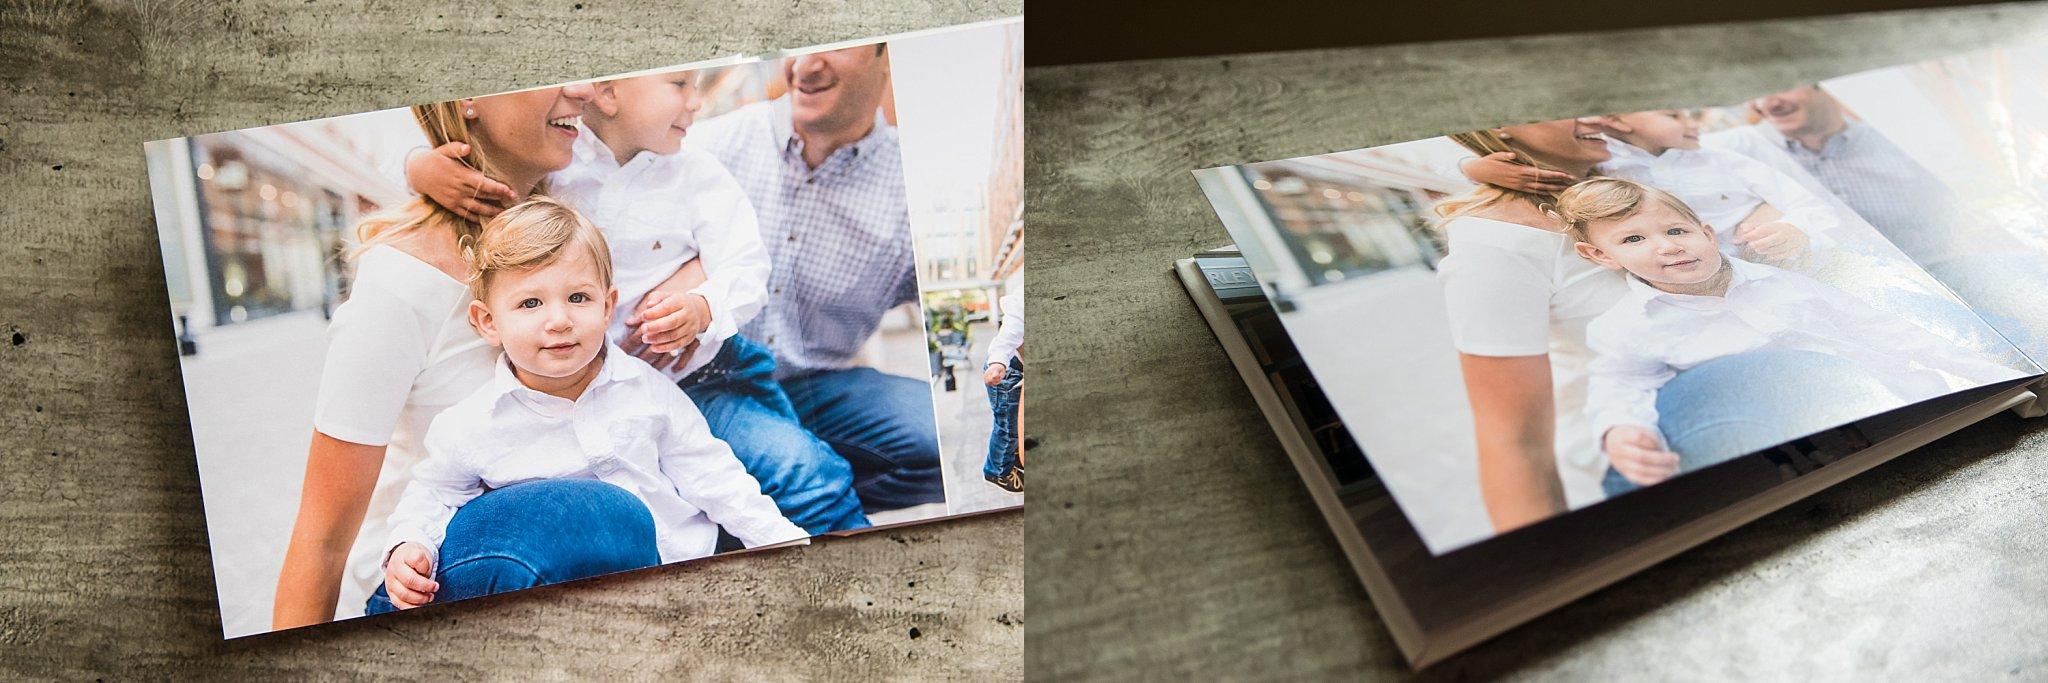 5-important-reasons-to-print-family-photos-dc-family-photographers (1).jpg